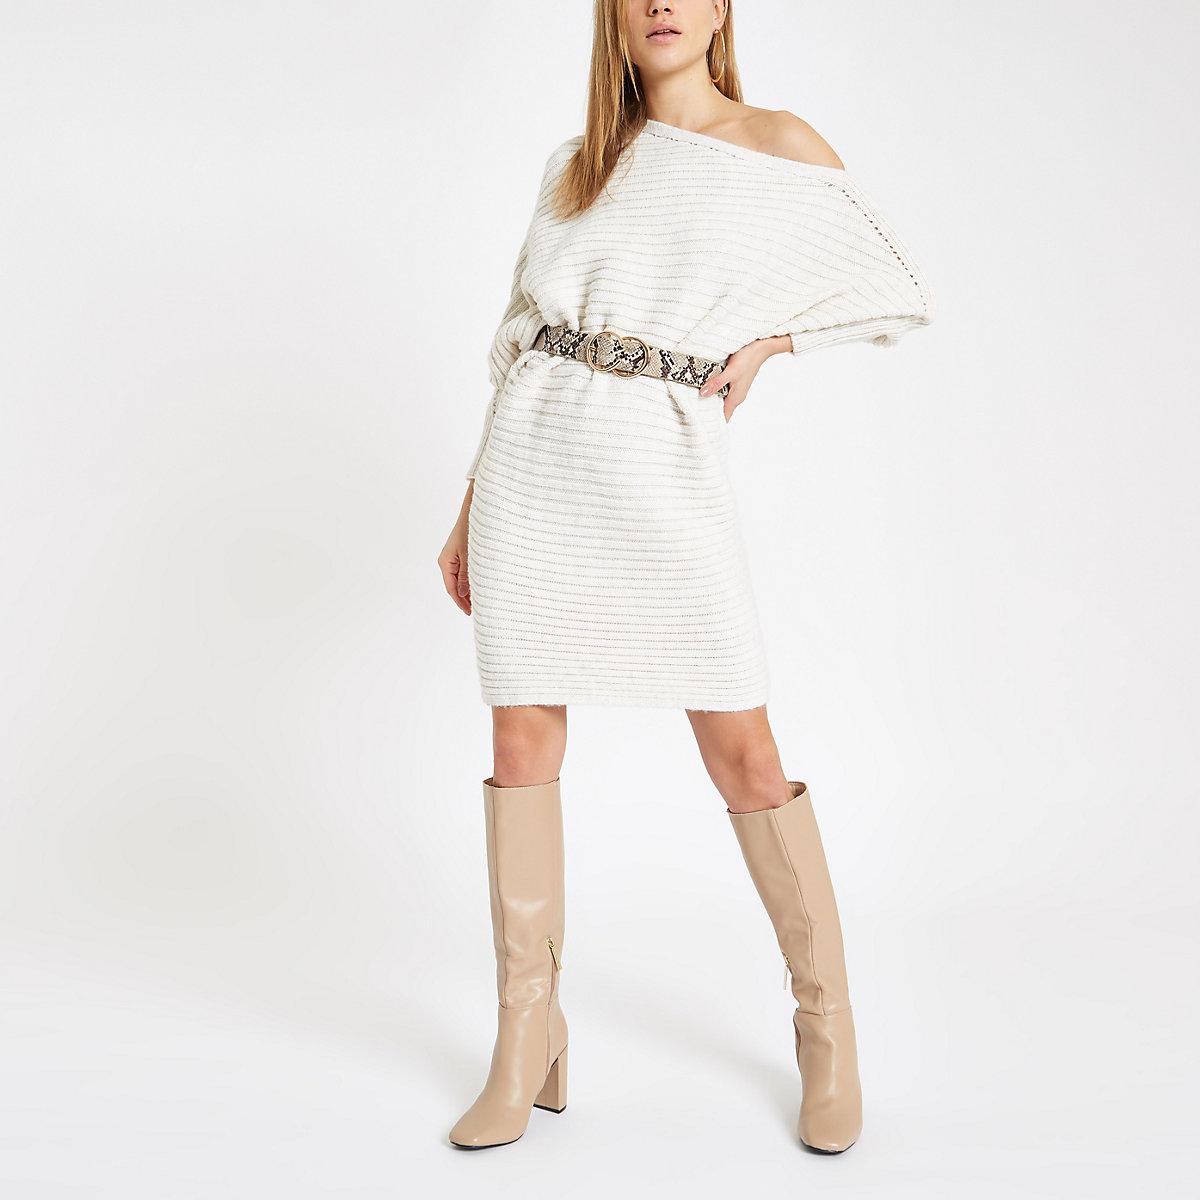 4c936ef1e2 Cream knit asymmetric jumper dress - Swing Dresses - Dresses - women